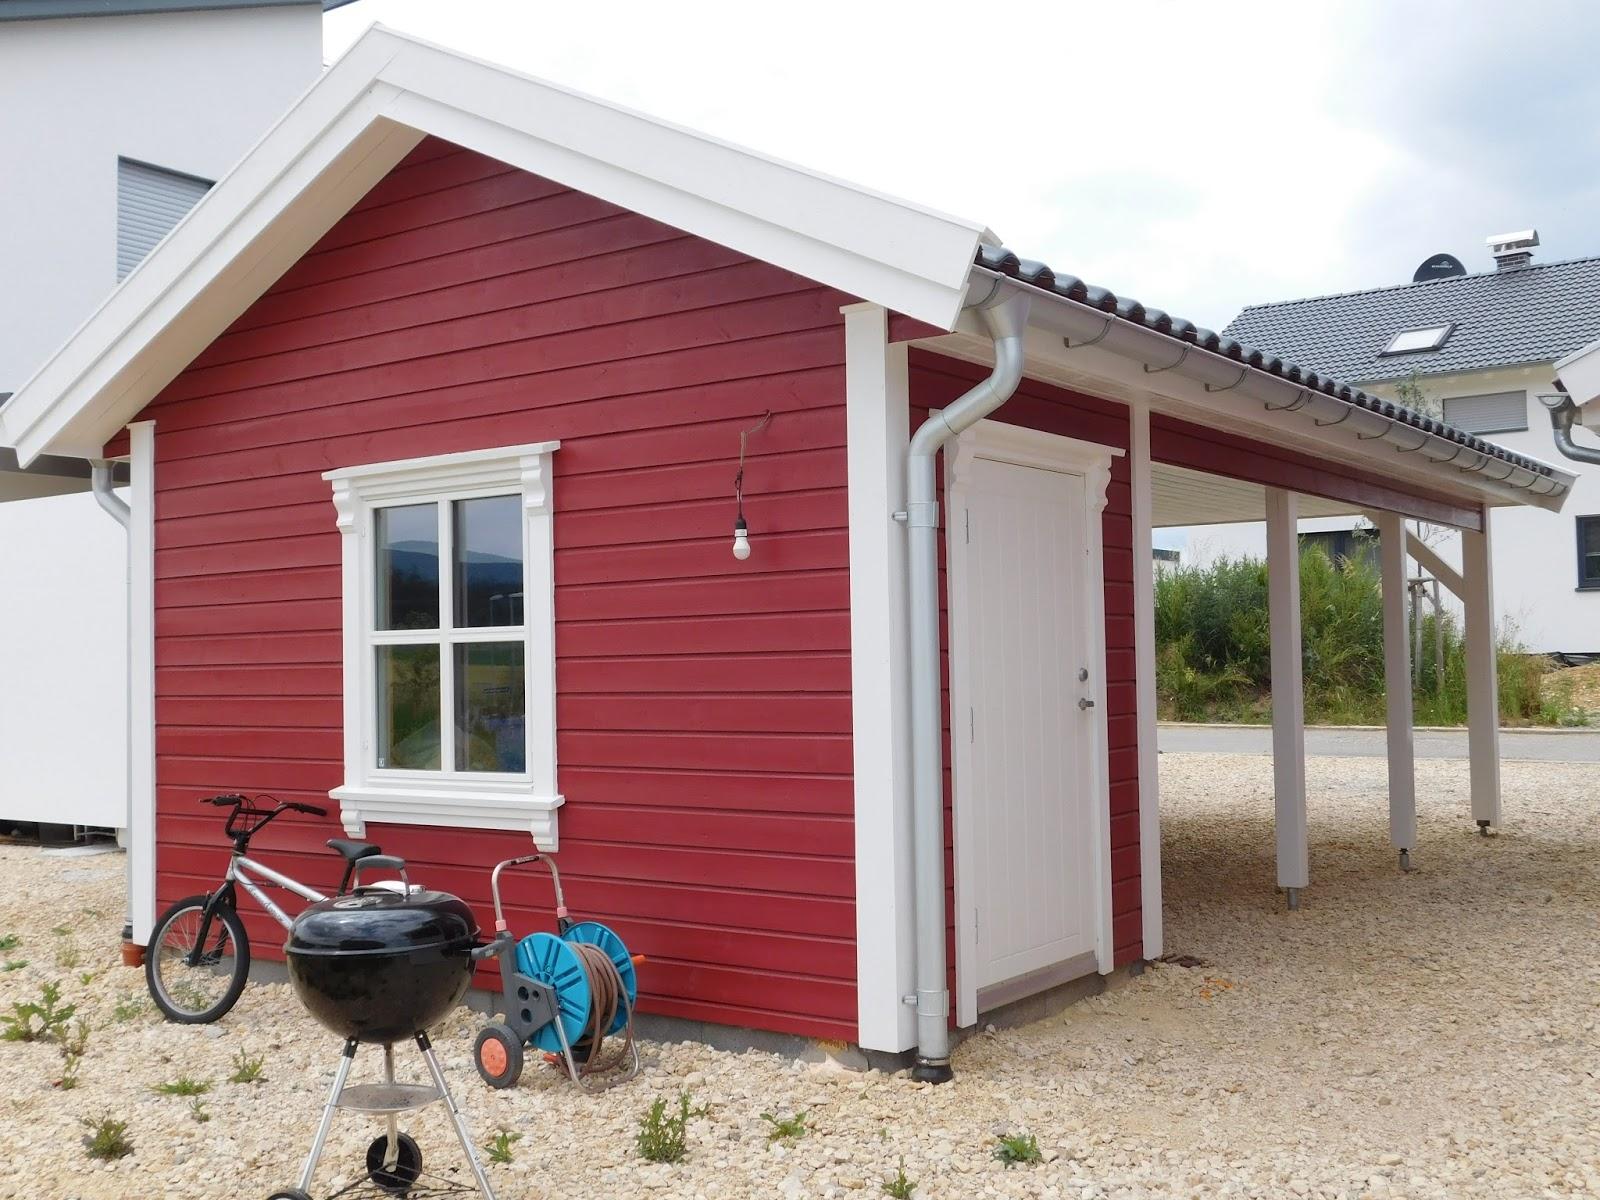 Unser Norge Hus: ... Unser Carport War Ohne Farbe Trist